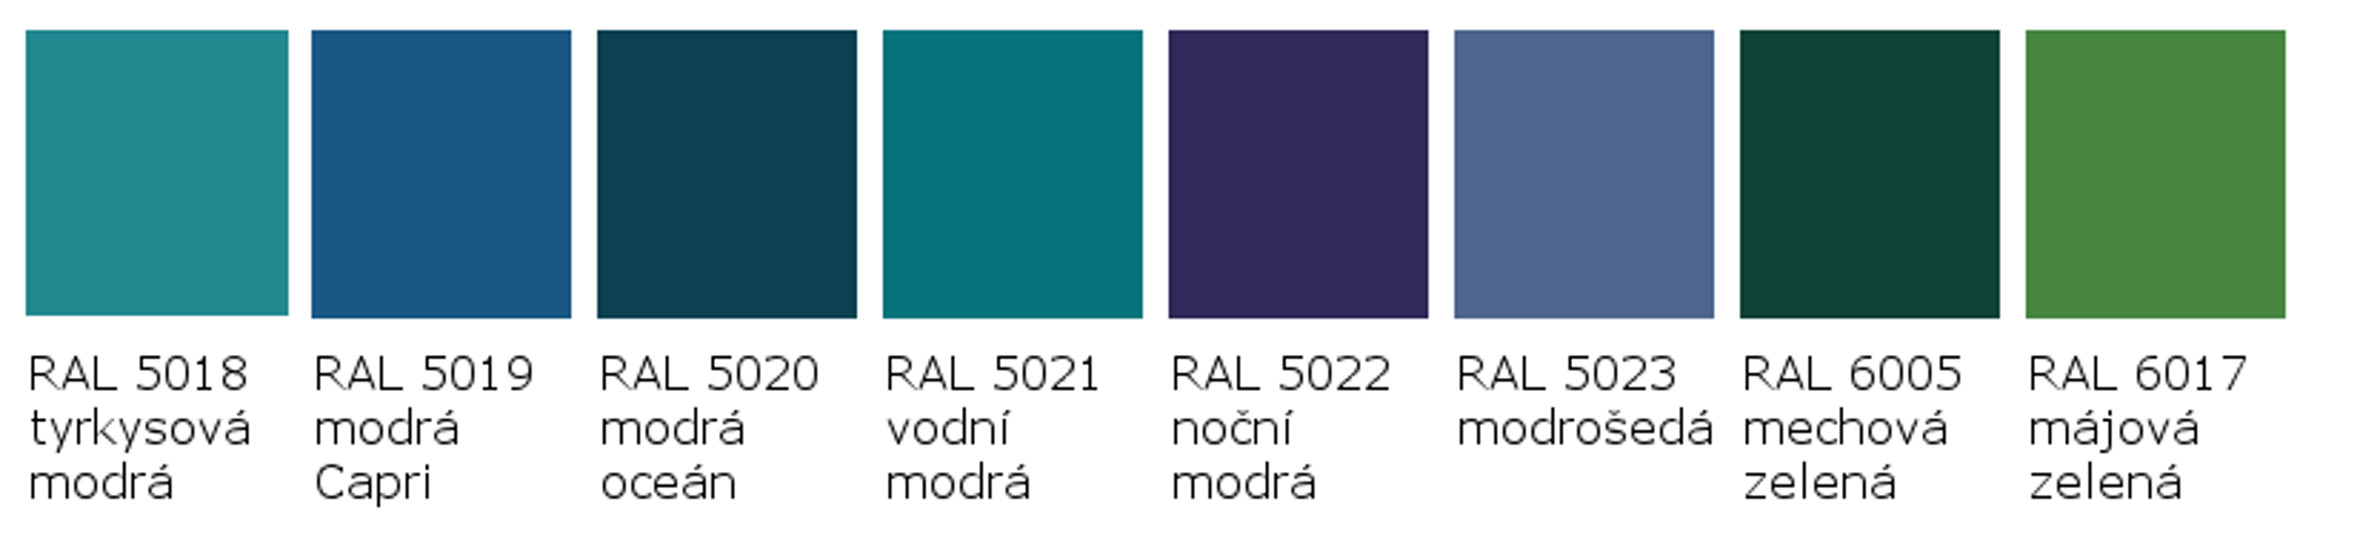 RAL 5018 - RAL 6017